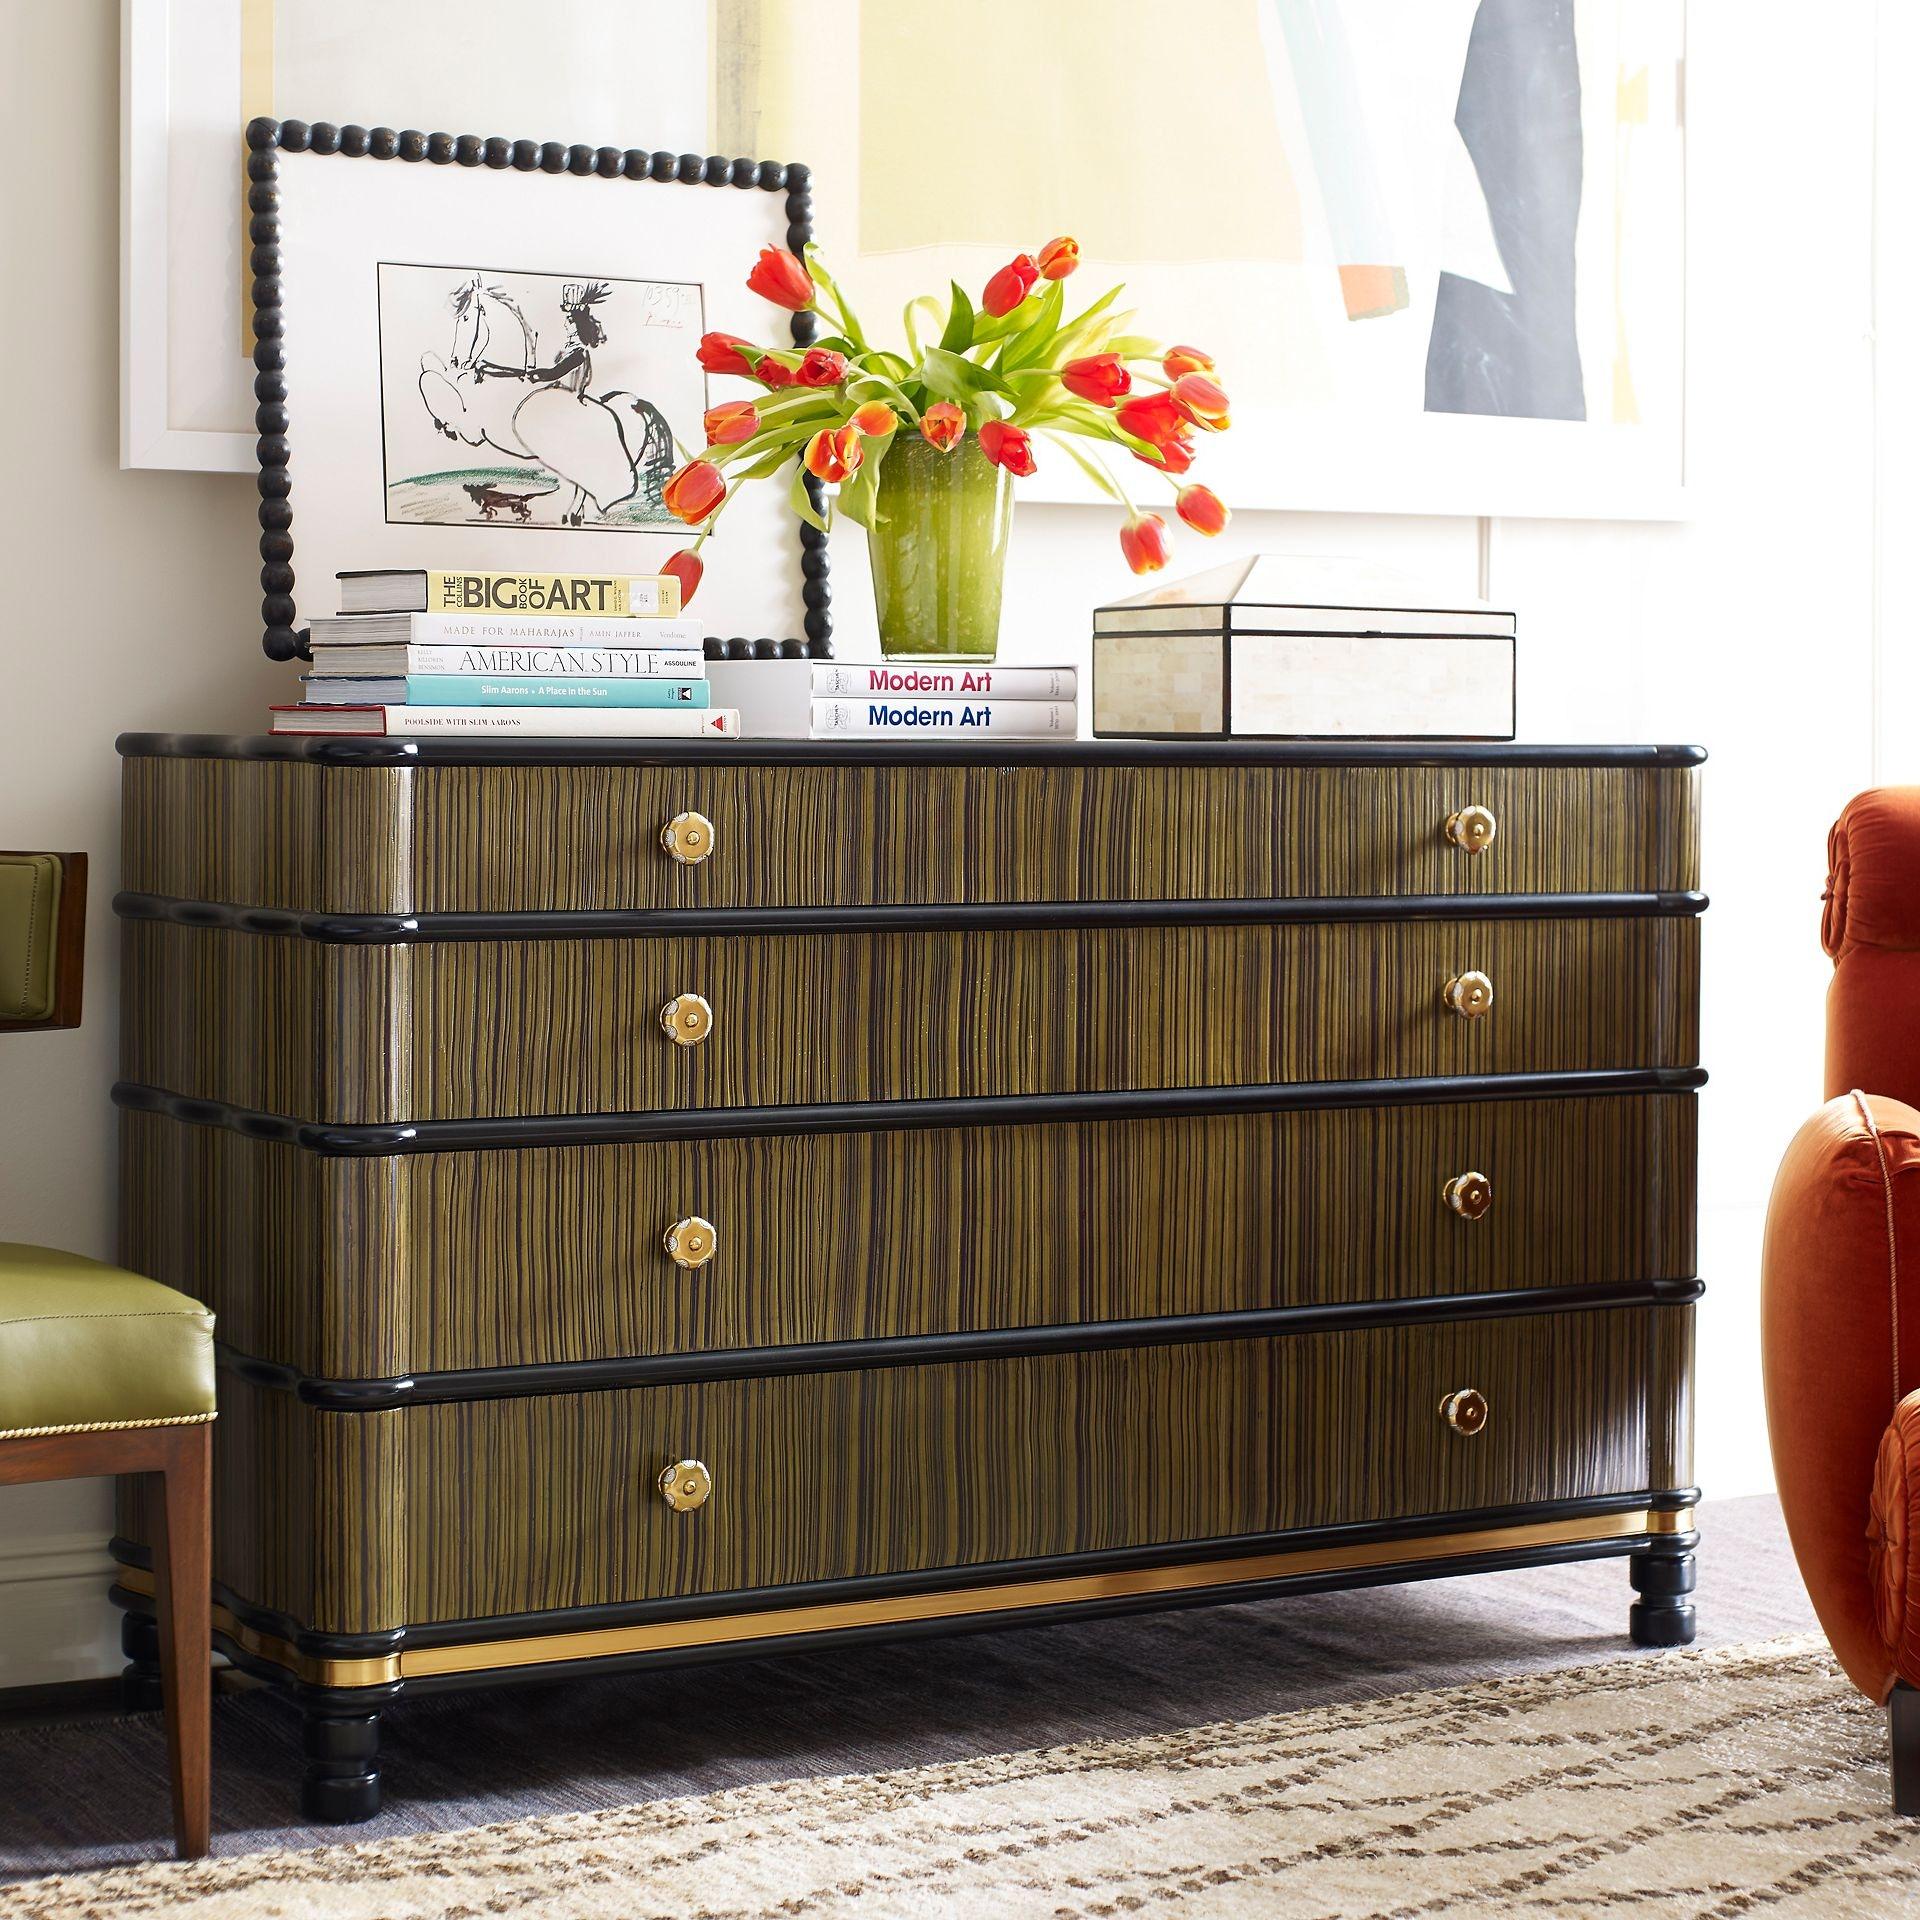 Henredon Furniture Jeffrey Bilhuber Prescott Dining Chair 8101 27 122